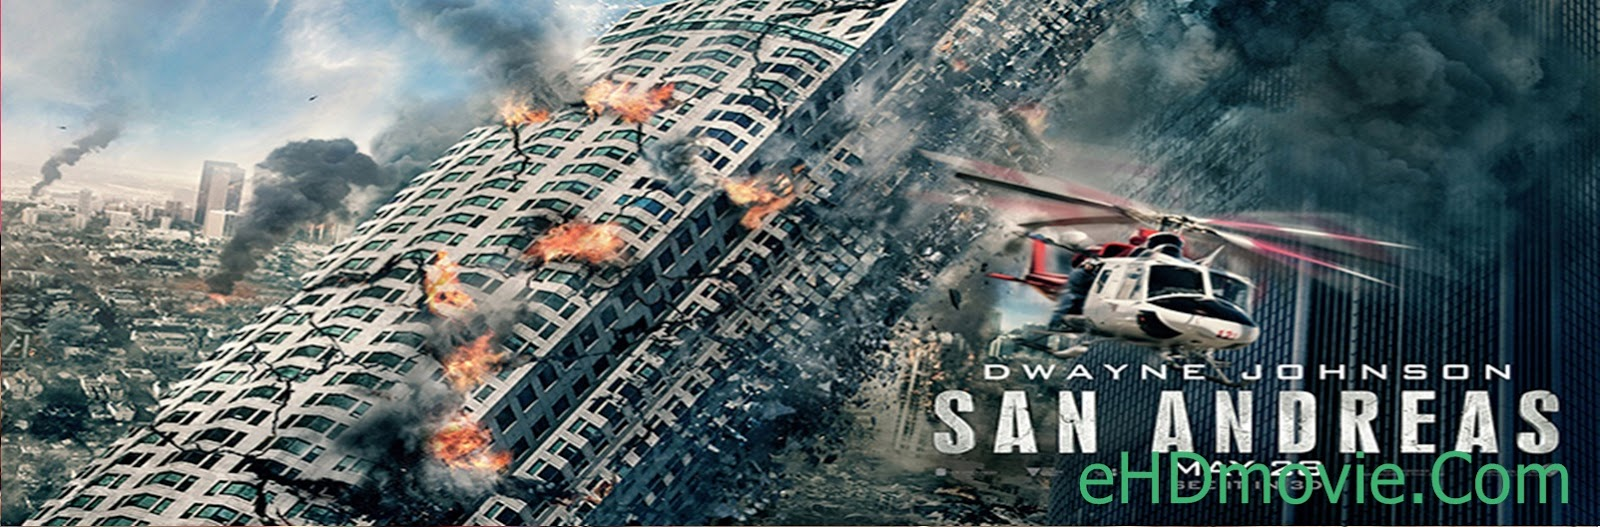 san andreas full movie free download 480p